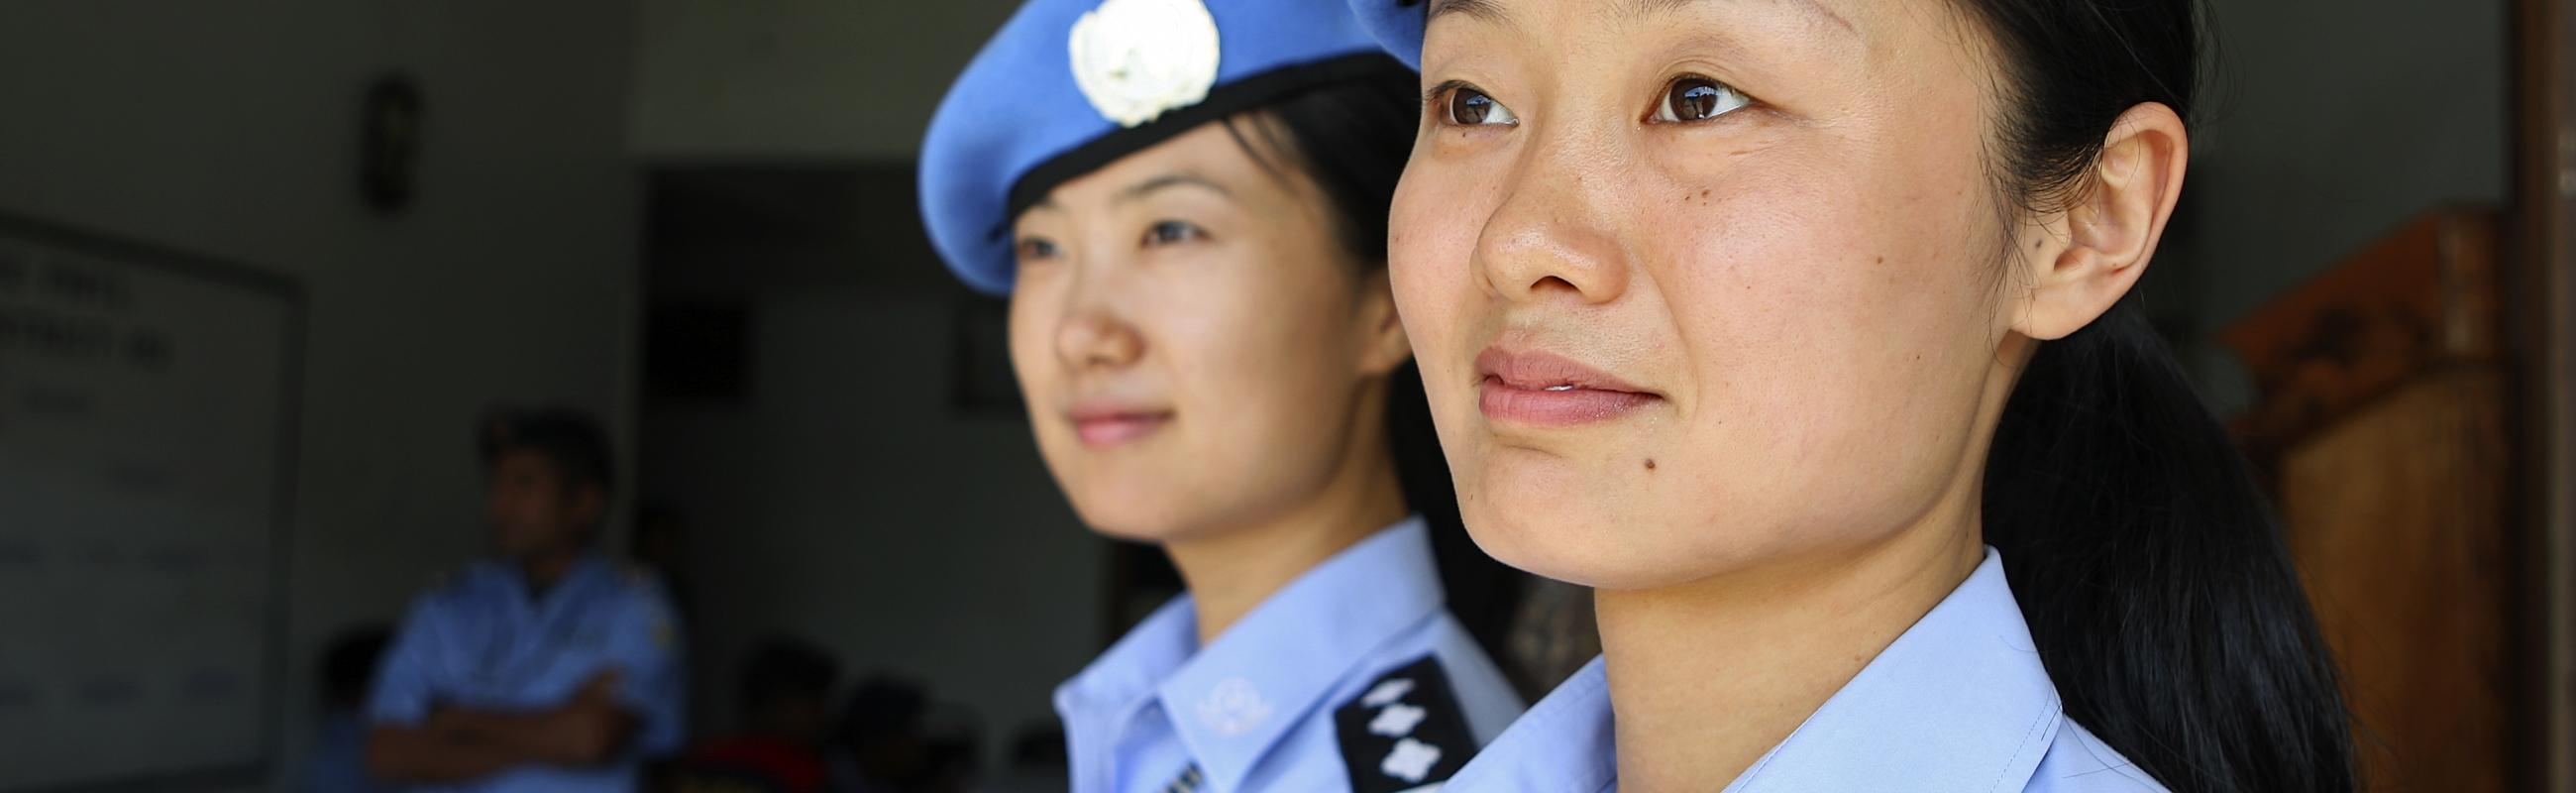 Peacekeeping – UNMIT